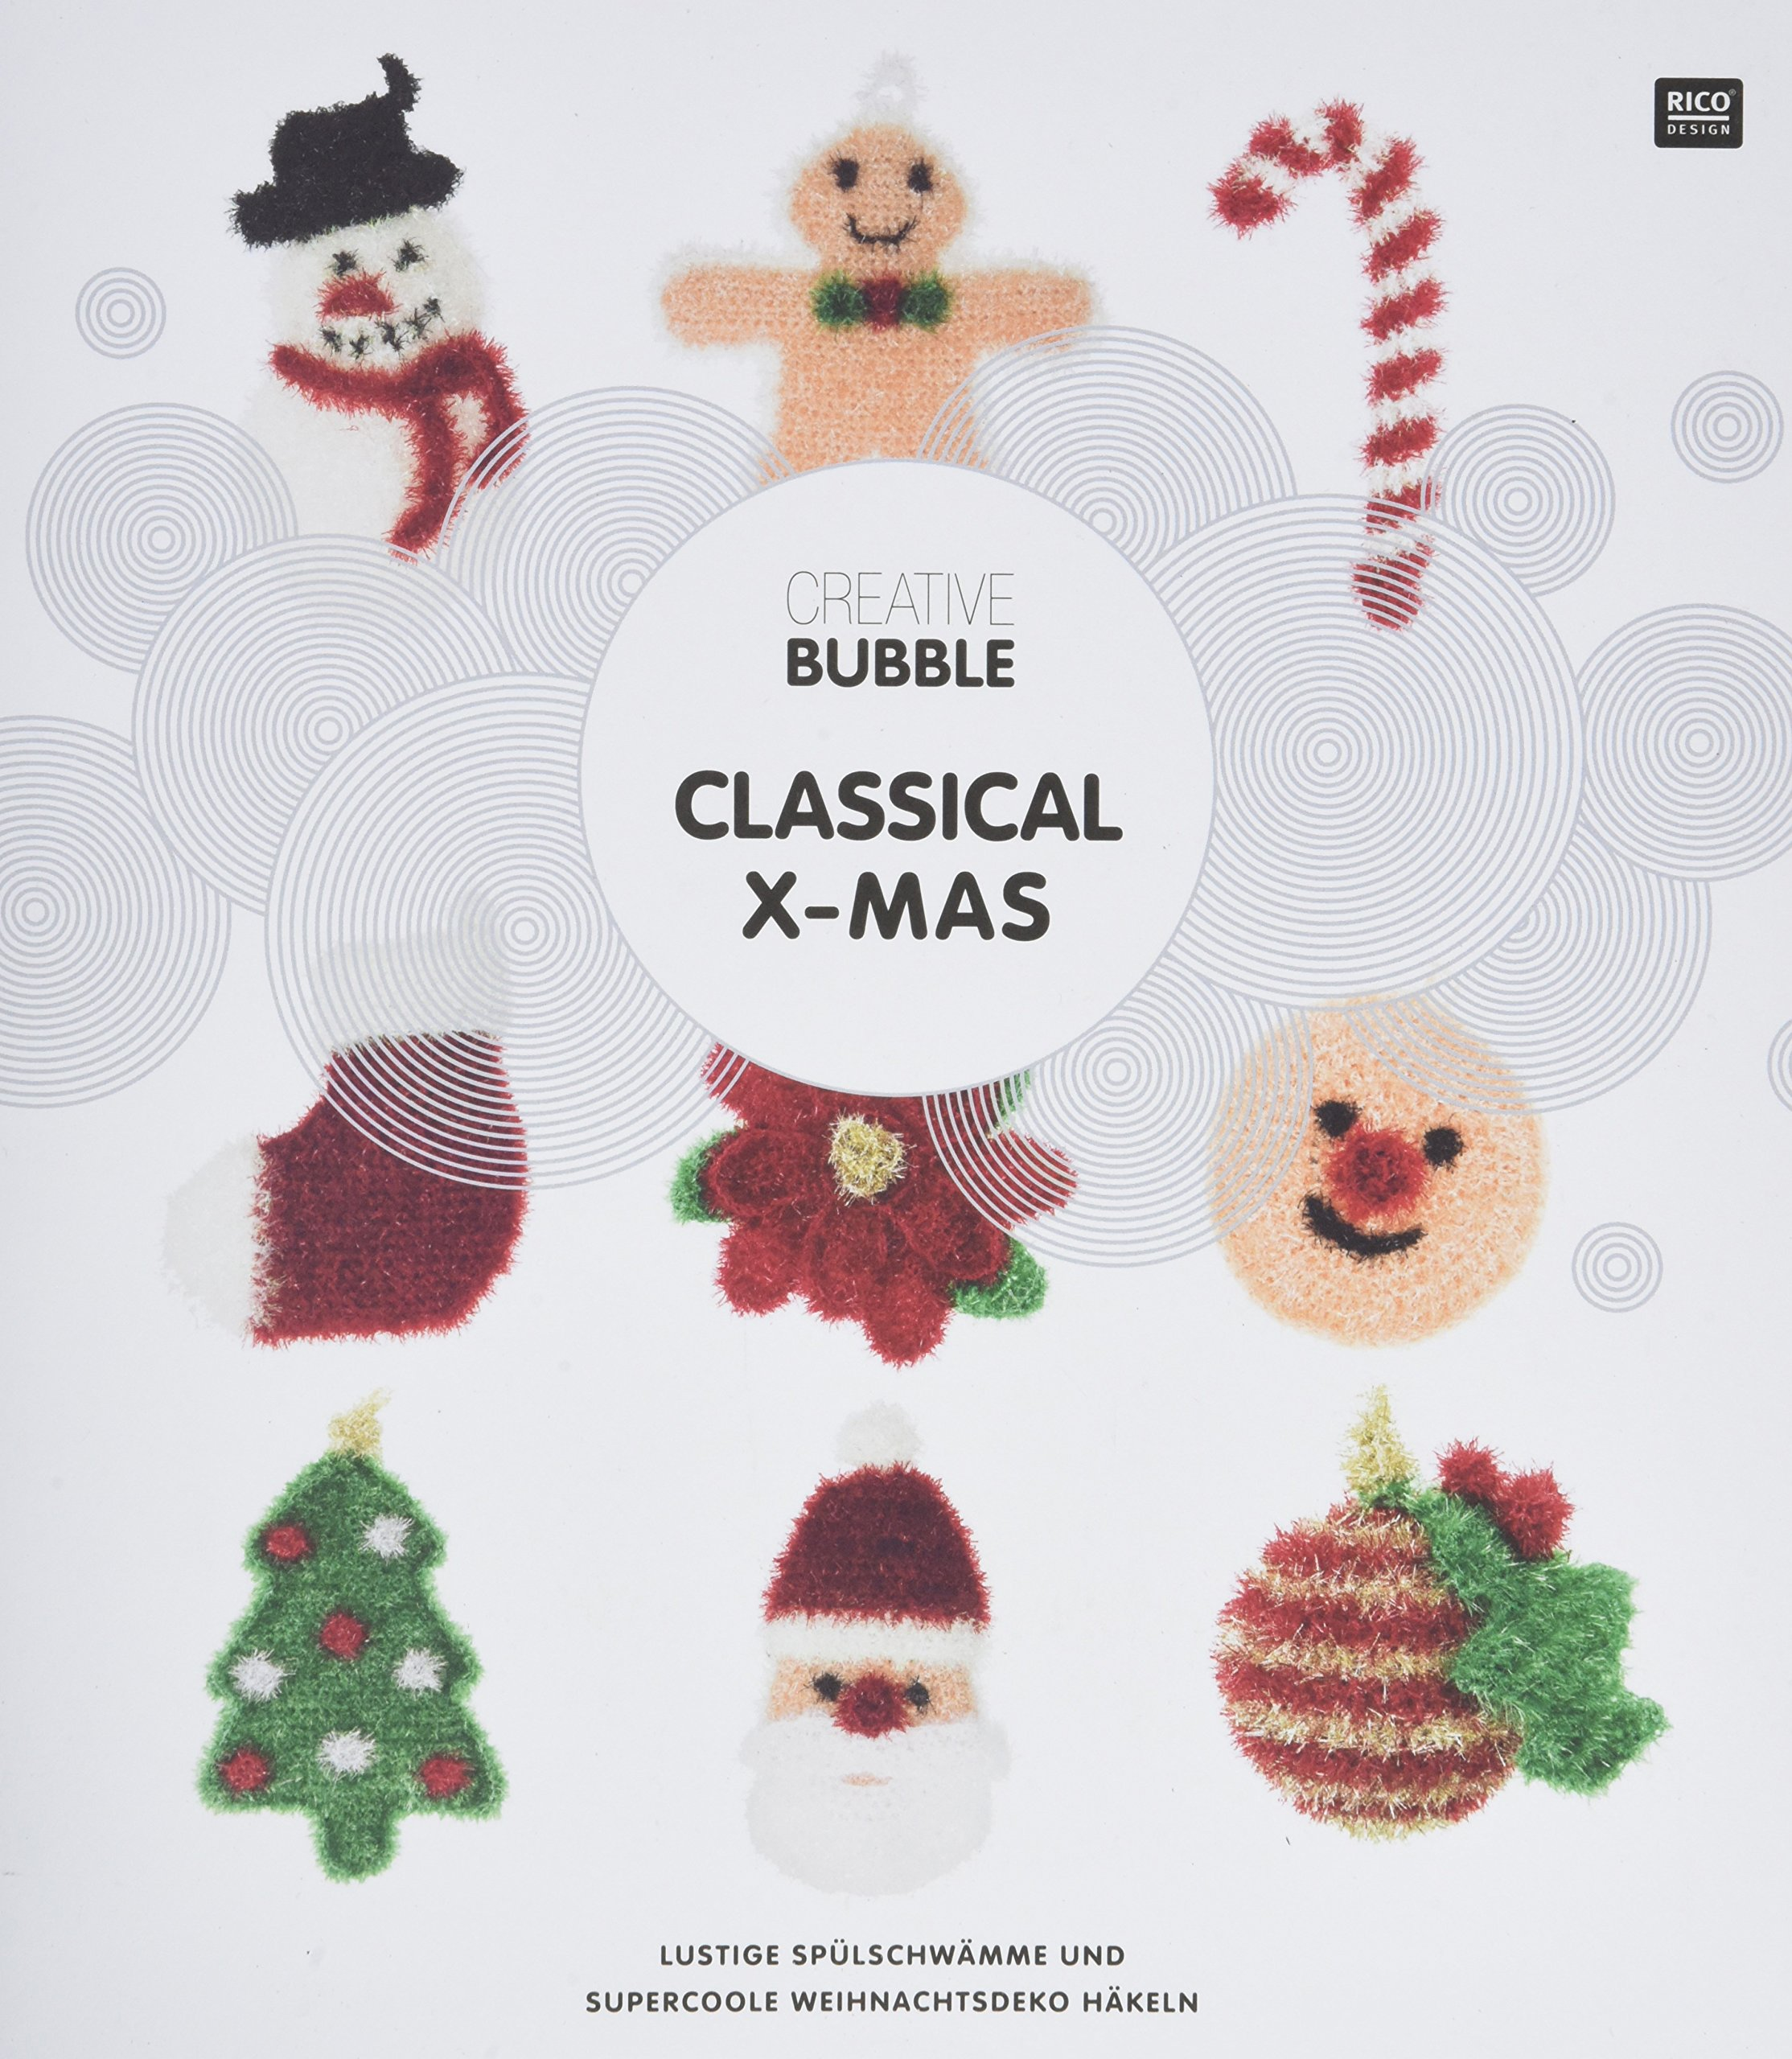 Creative Bubble Classical X Mas Festliche Weihnachtsdeko Häkeln